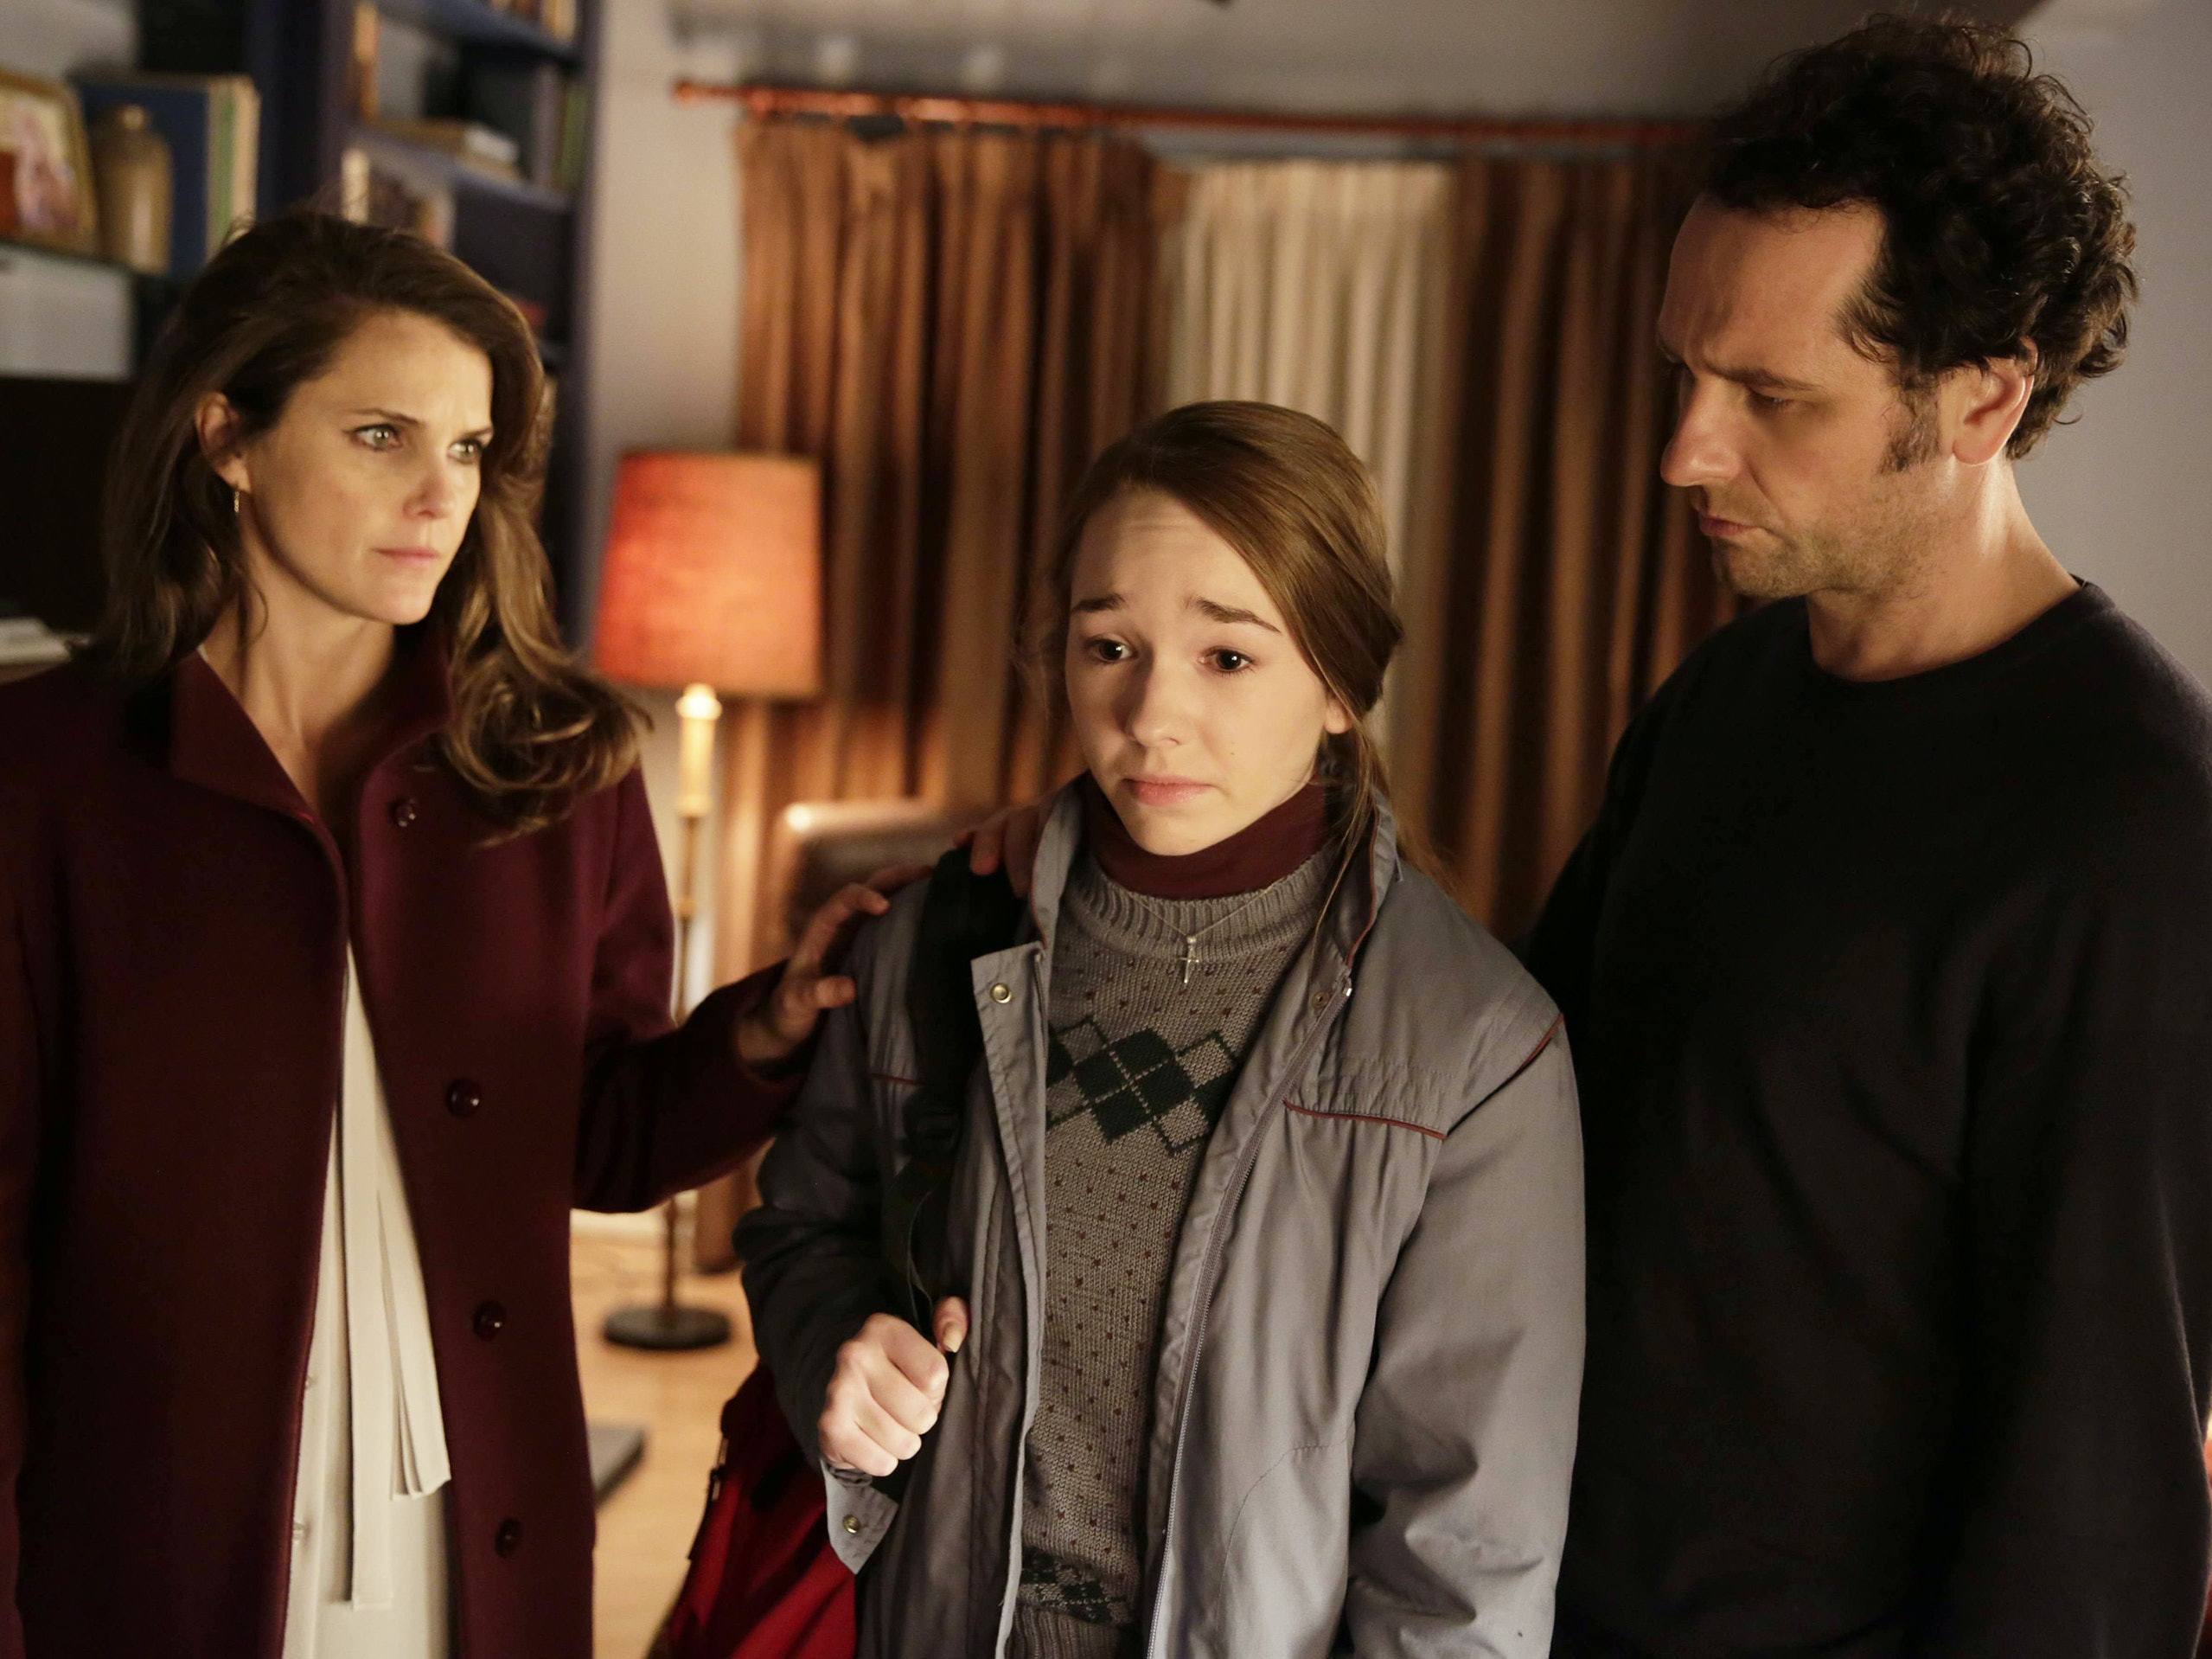 'The Americans' Season 4 Brings Everyone Together